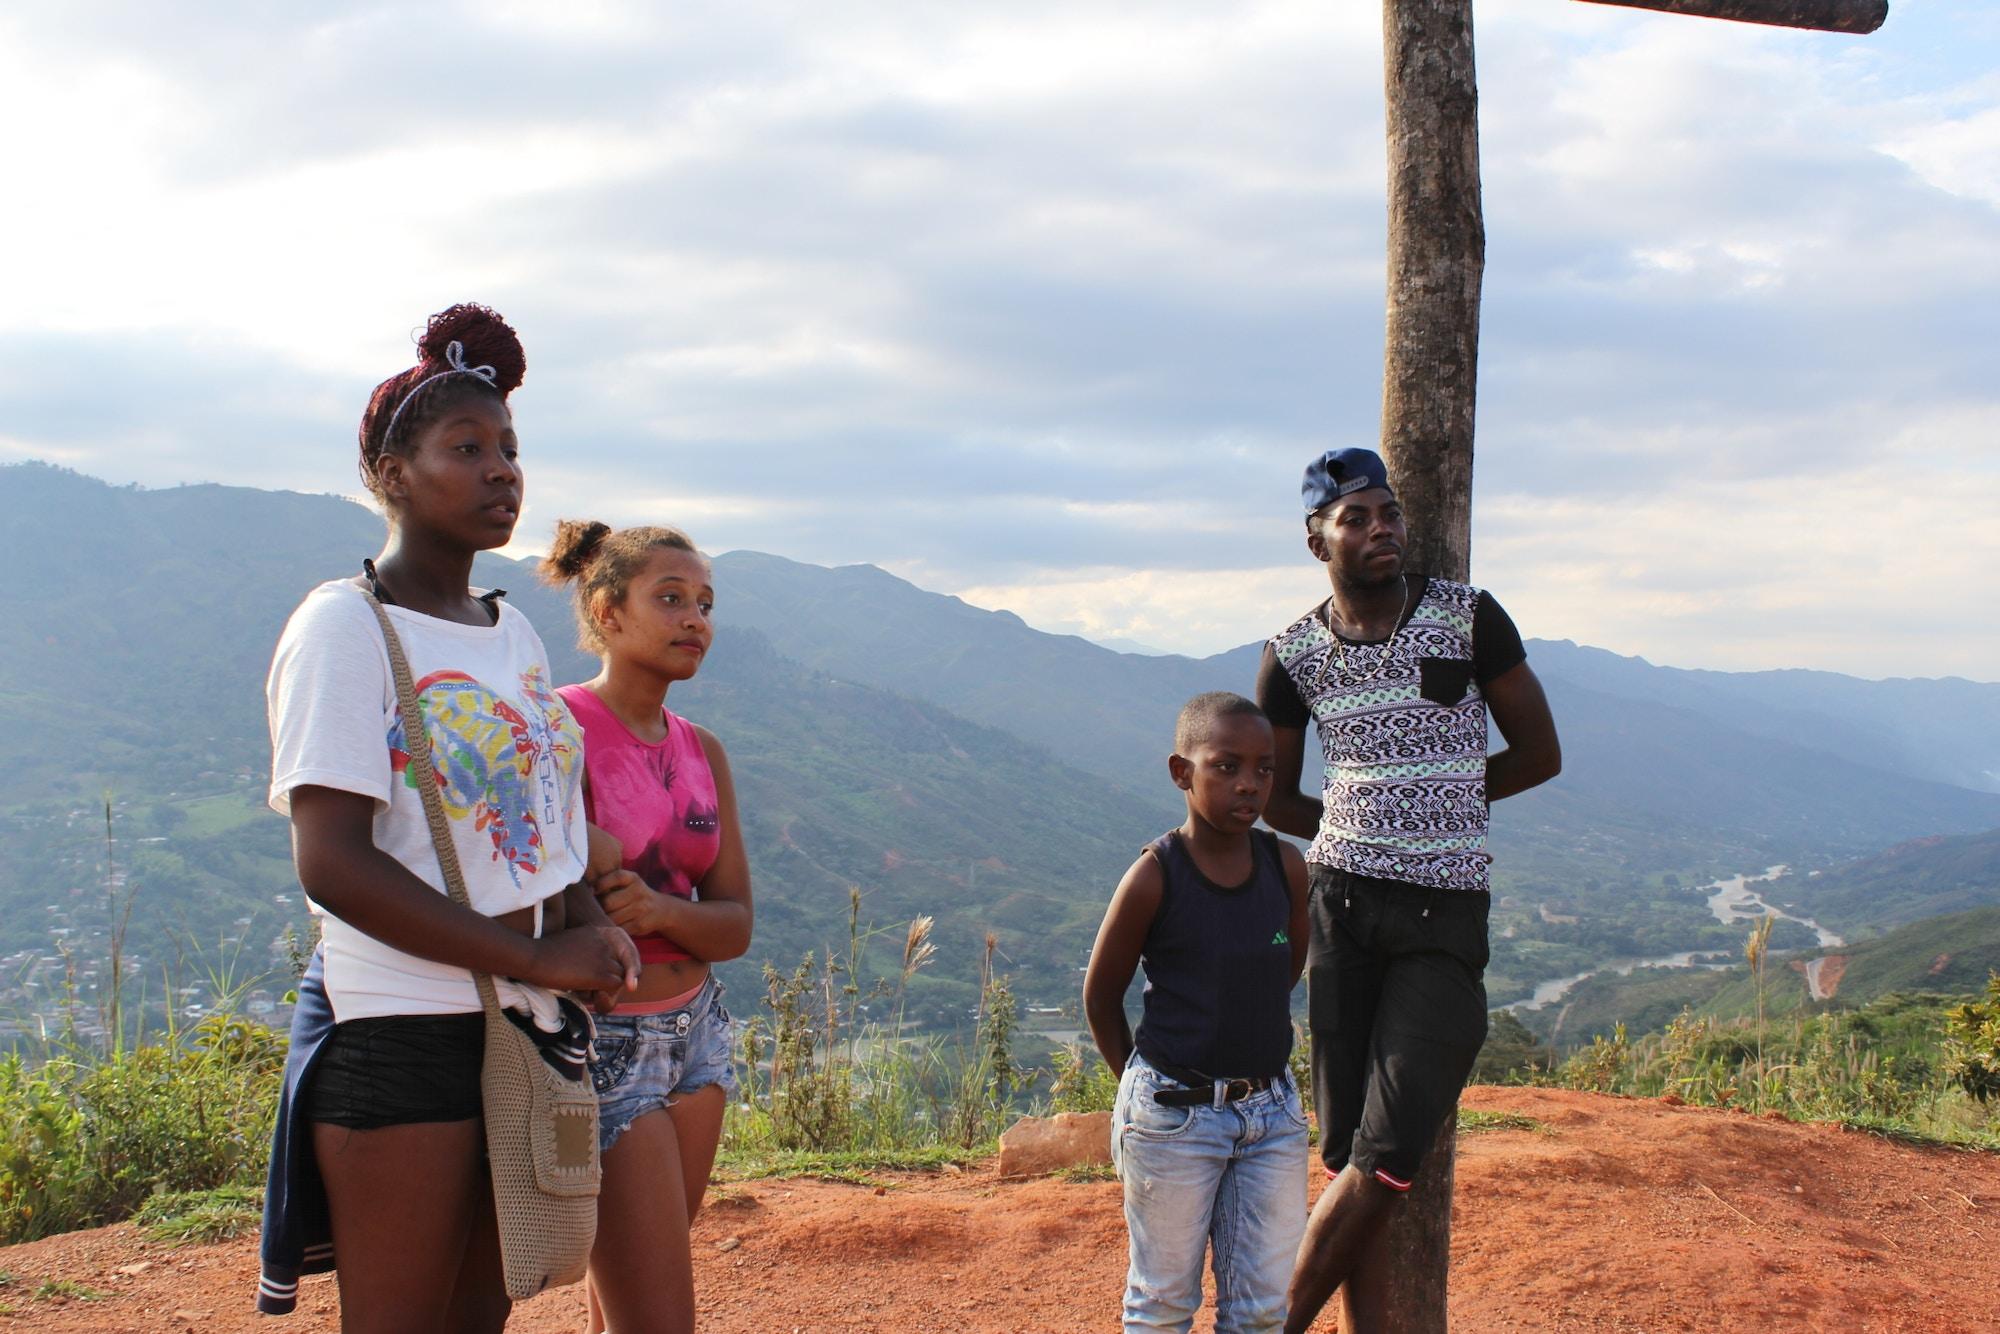 Ungdom-i-fjellet